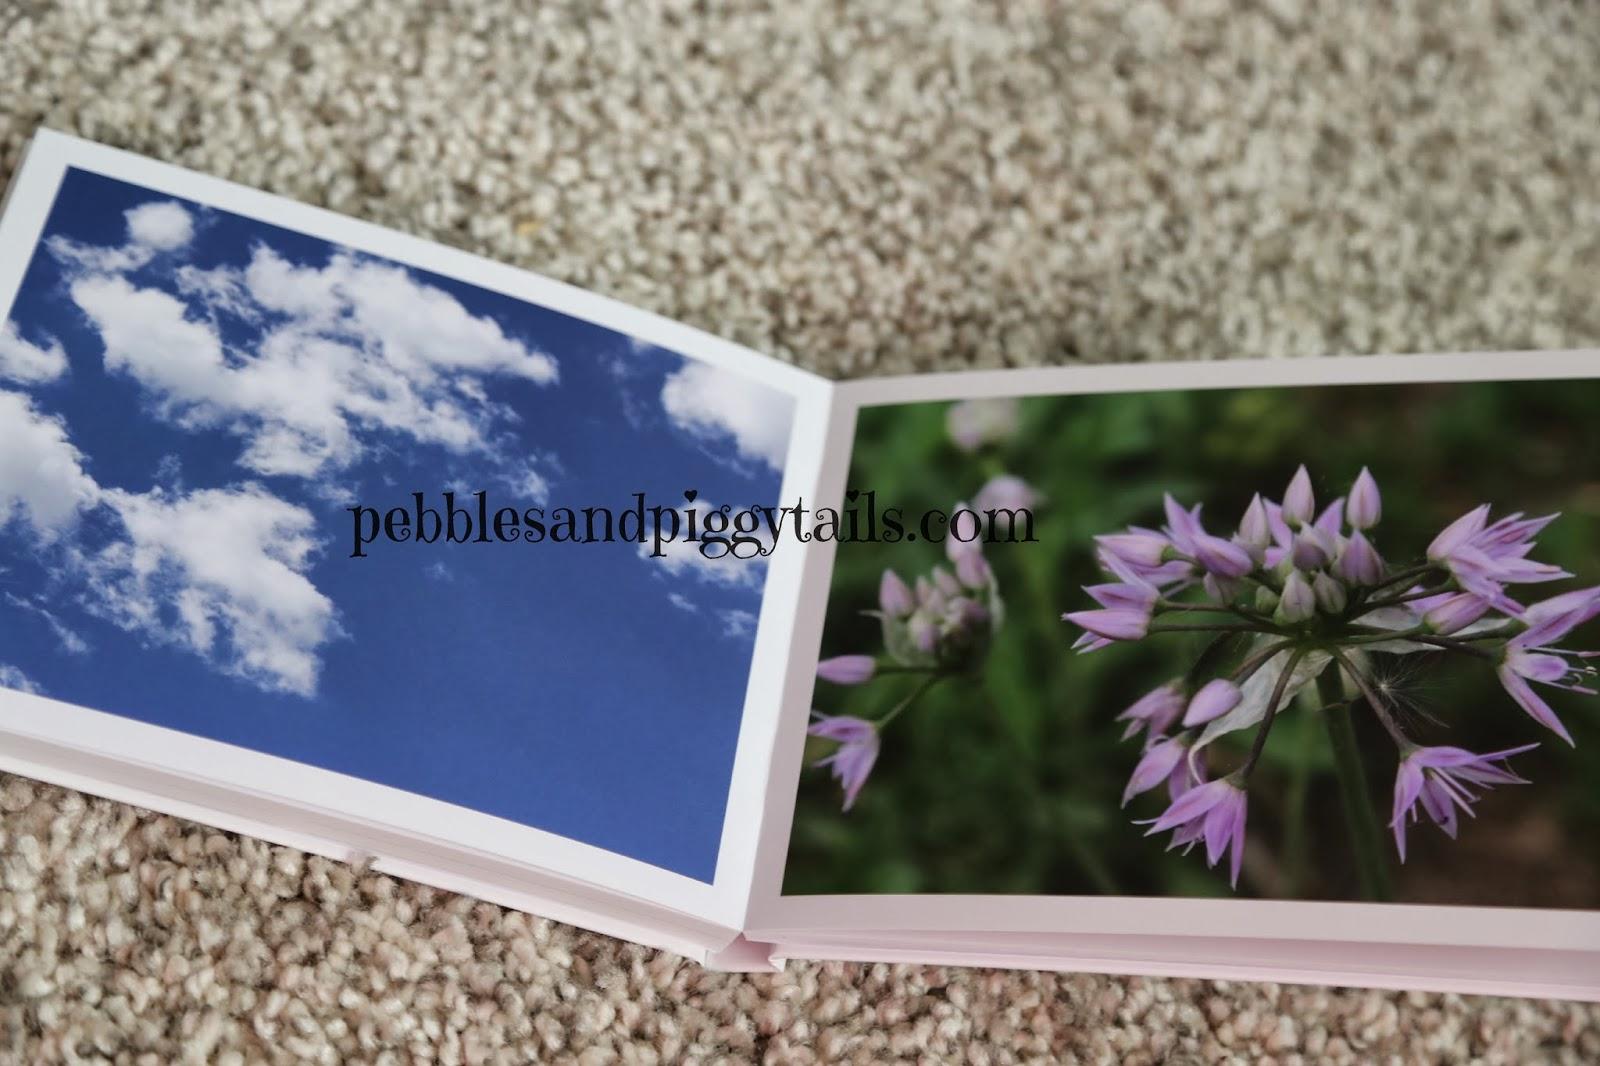 bob books photo books review